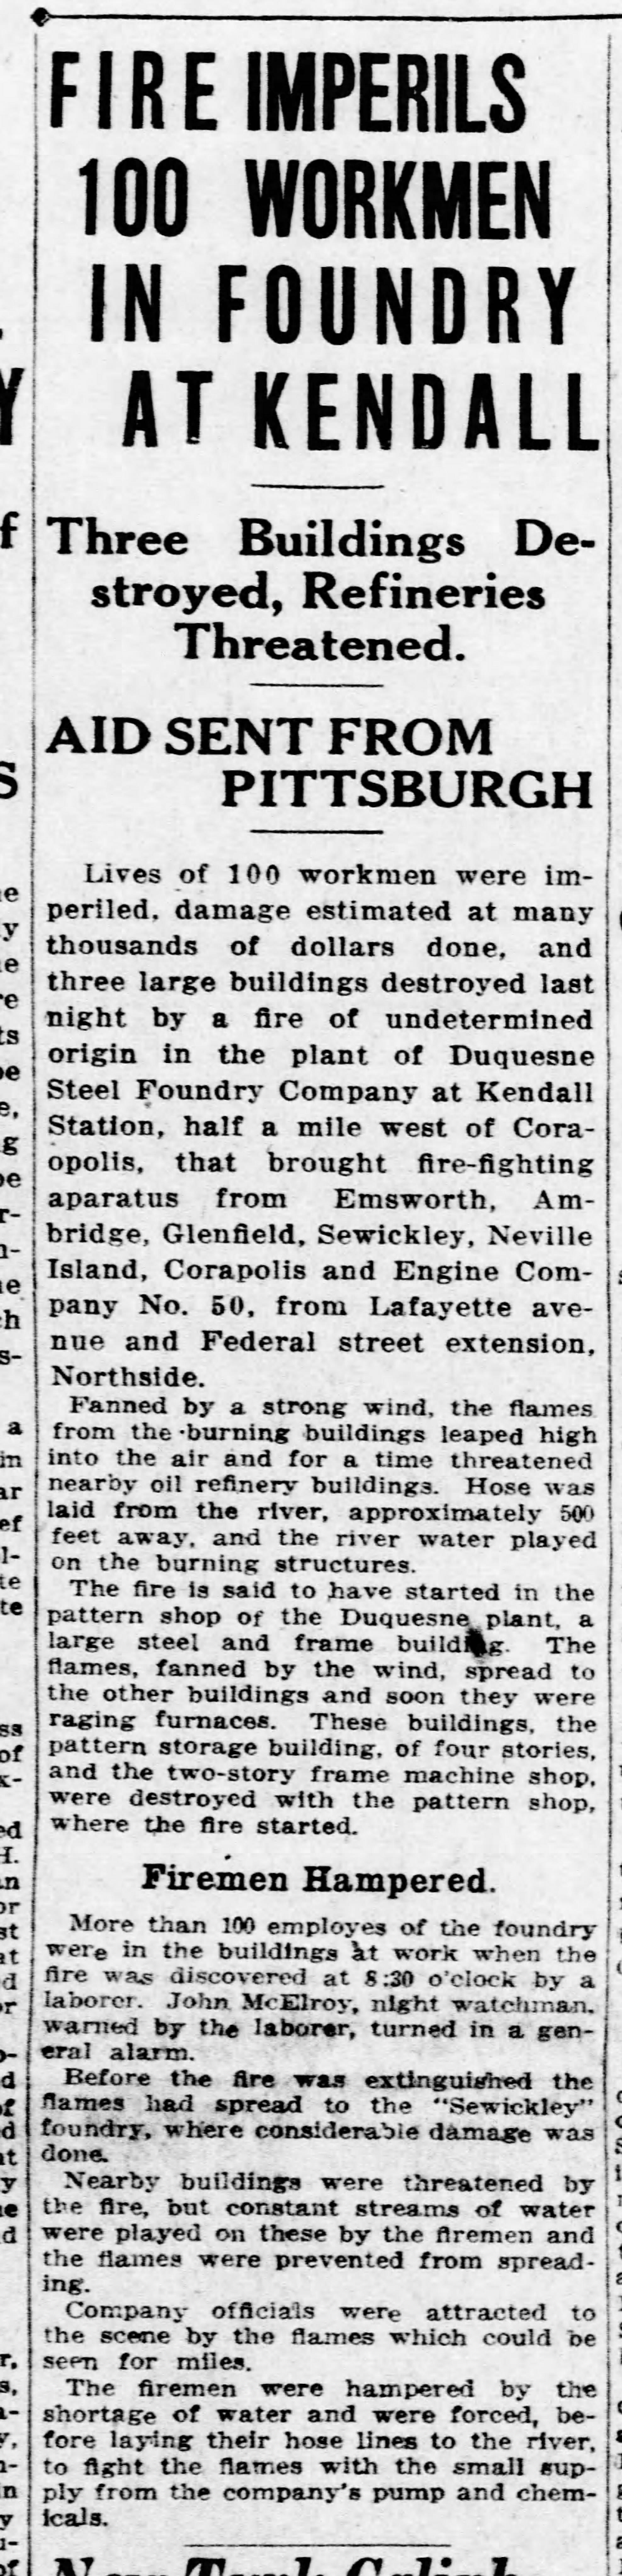 Pittsburgh Daily Post, November 21, 1922